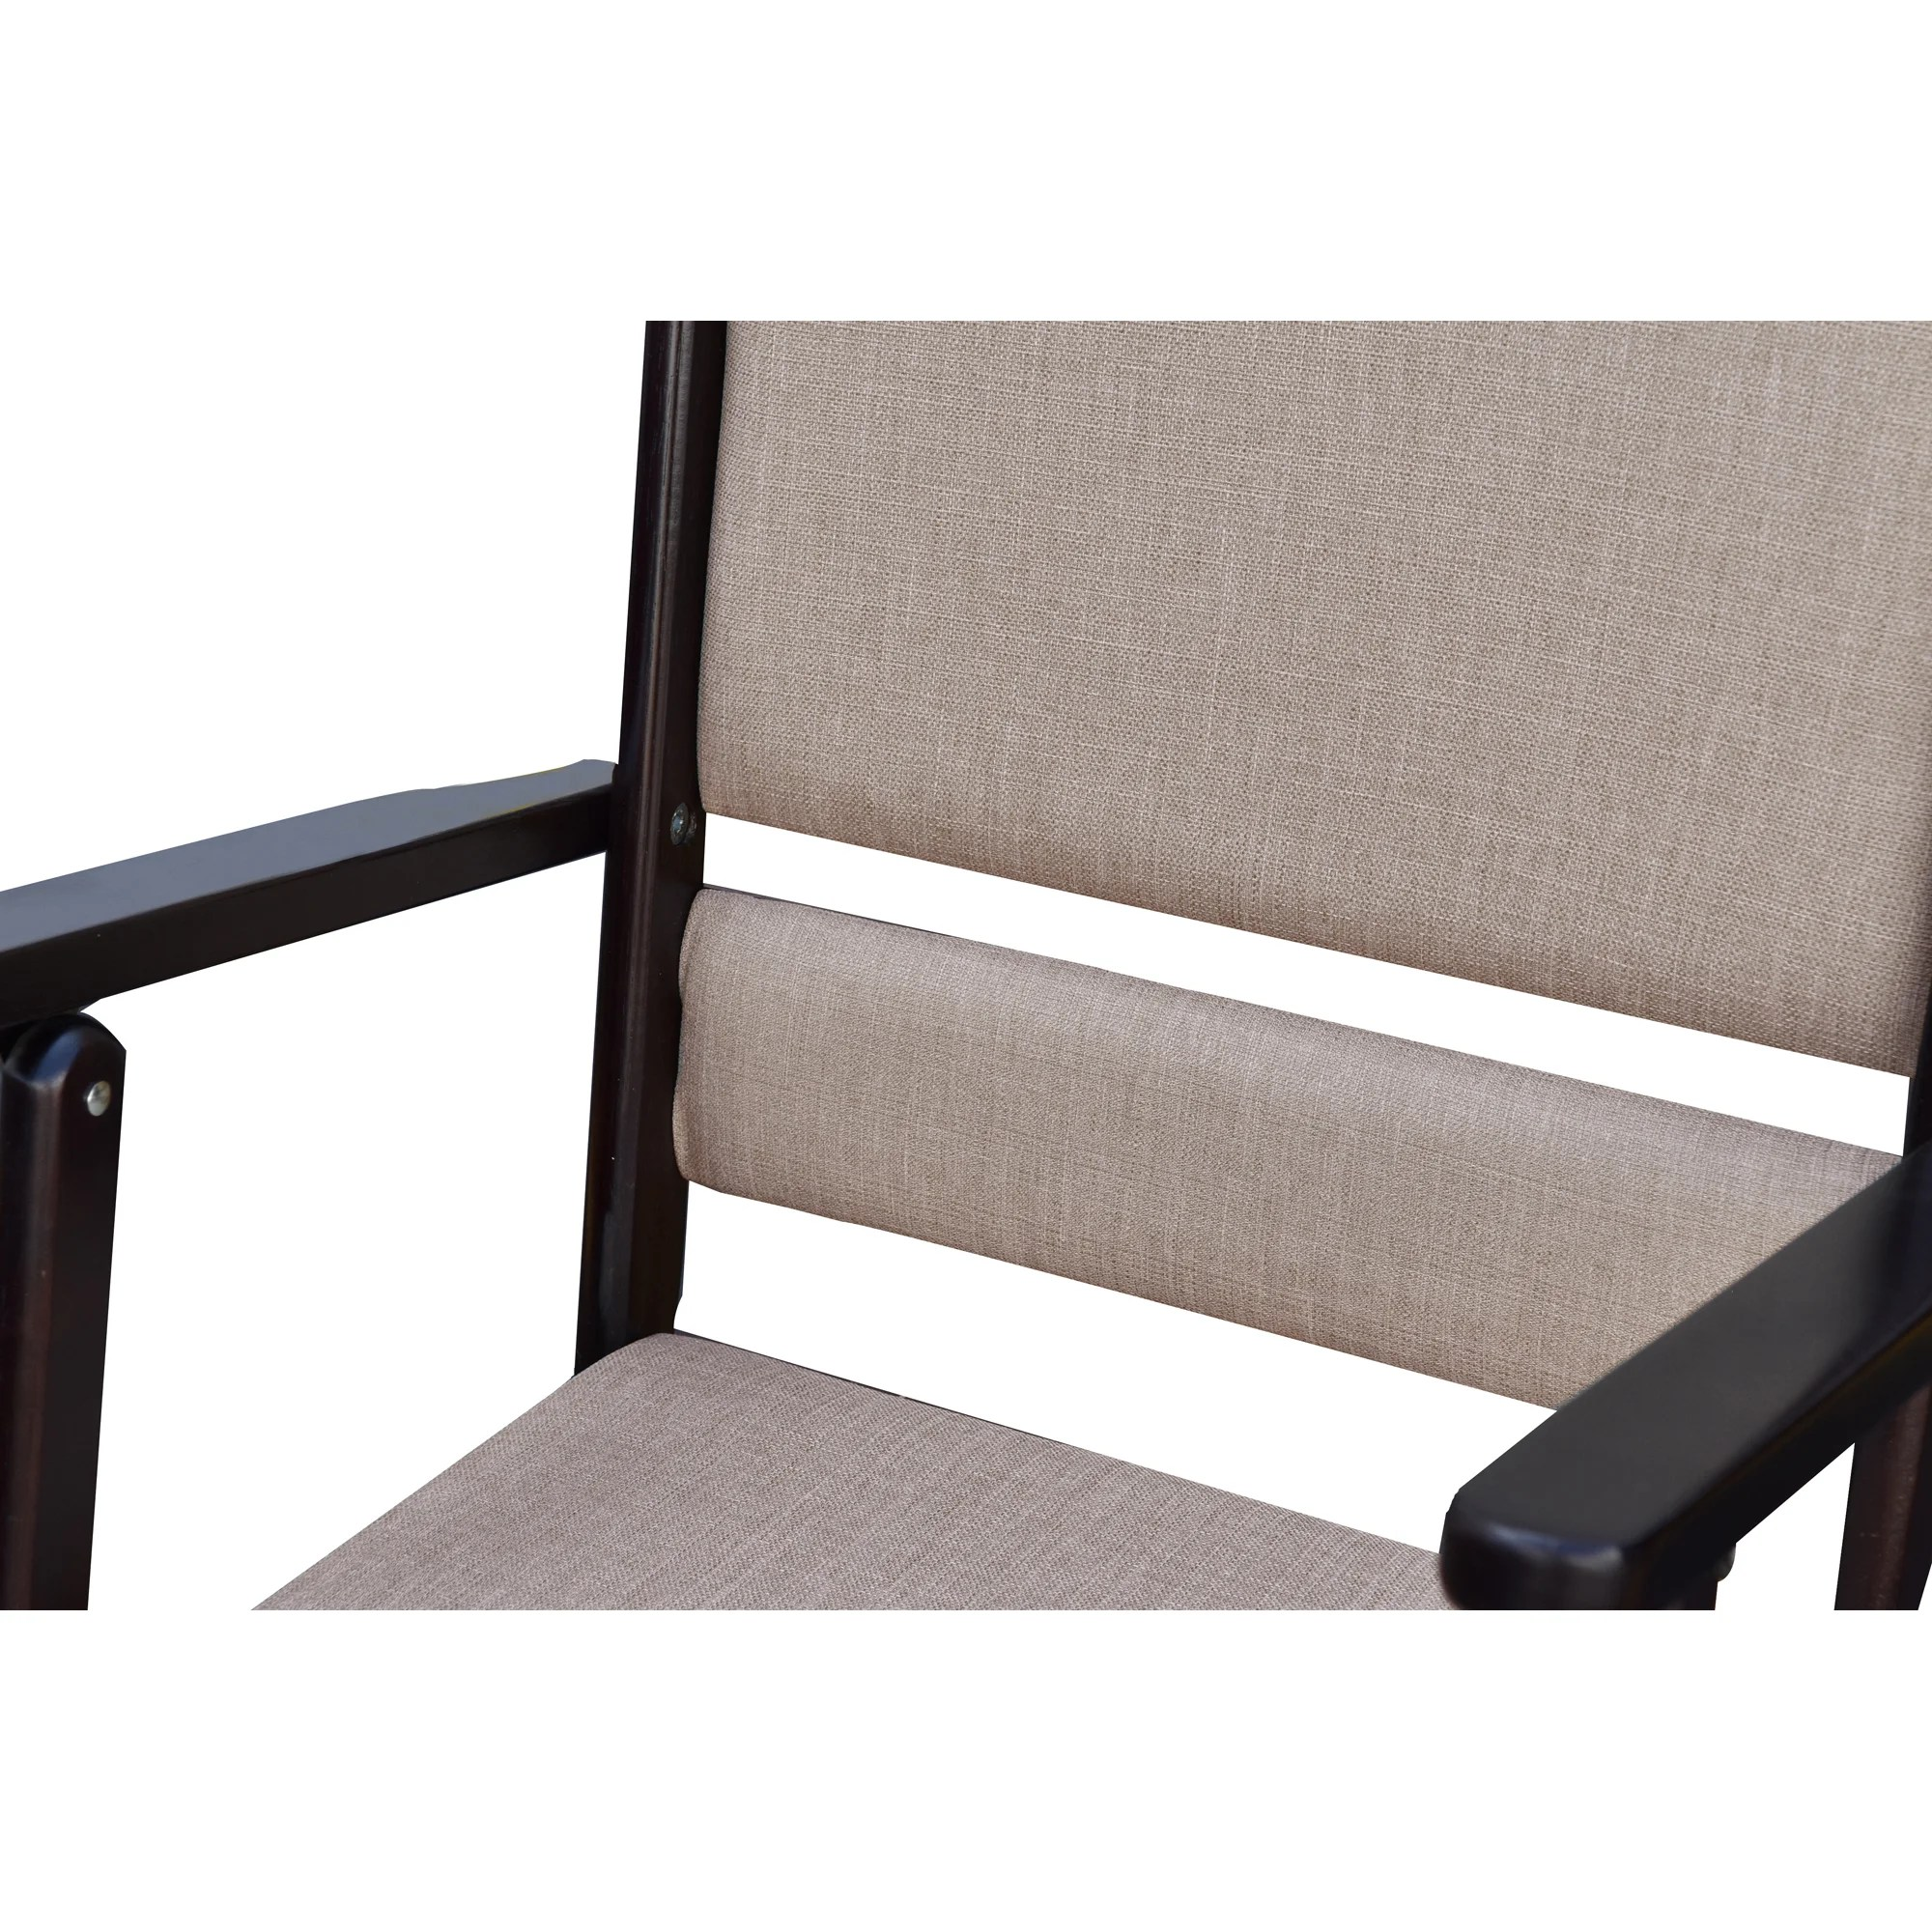 folding rocking chair wood cheap stackable chairs wildon home  cedar creek solid